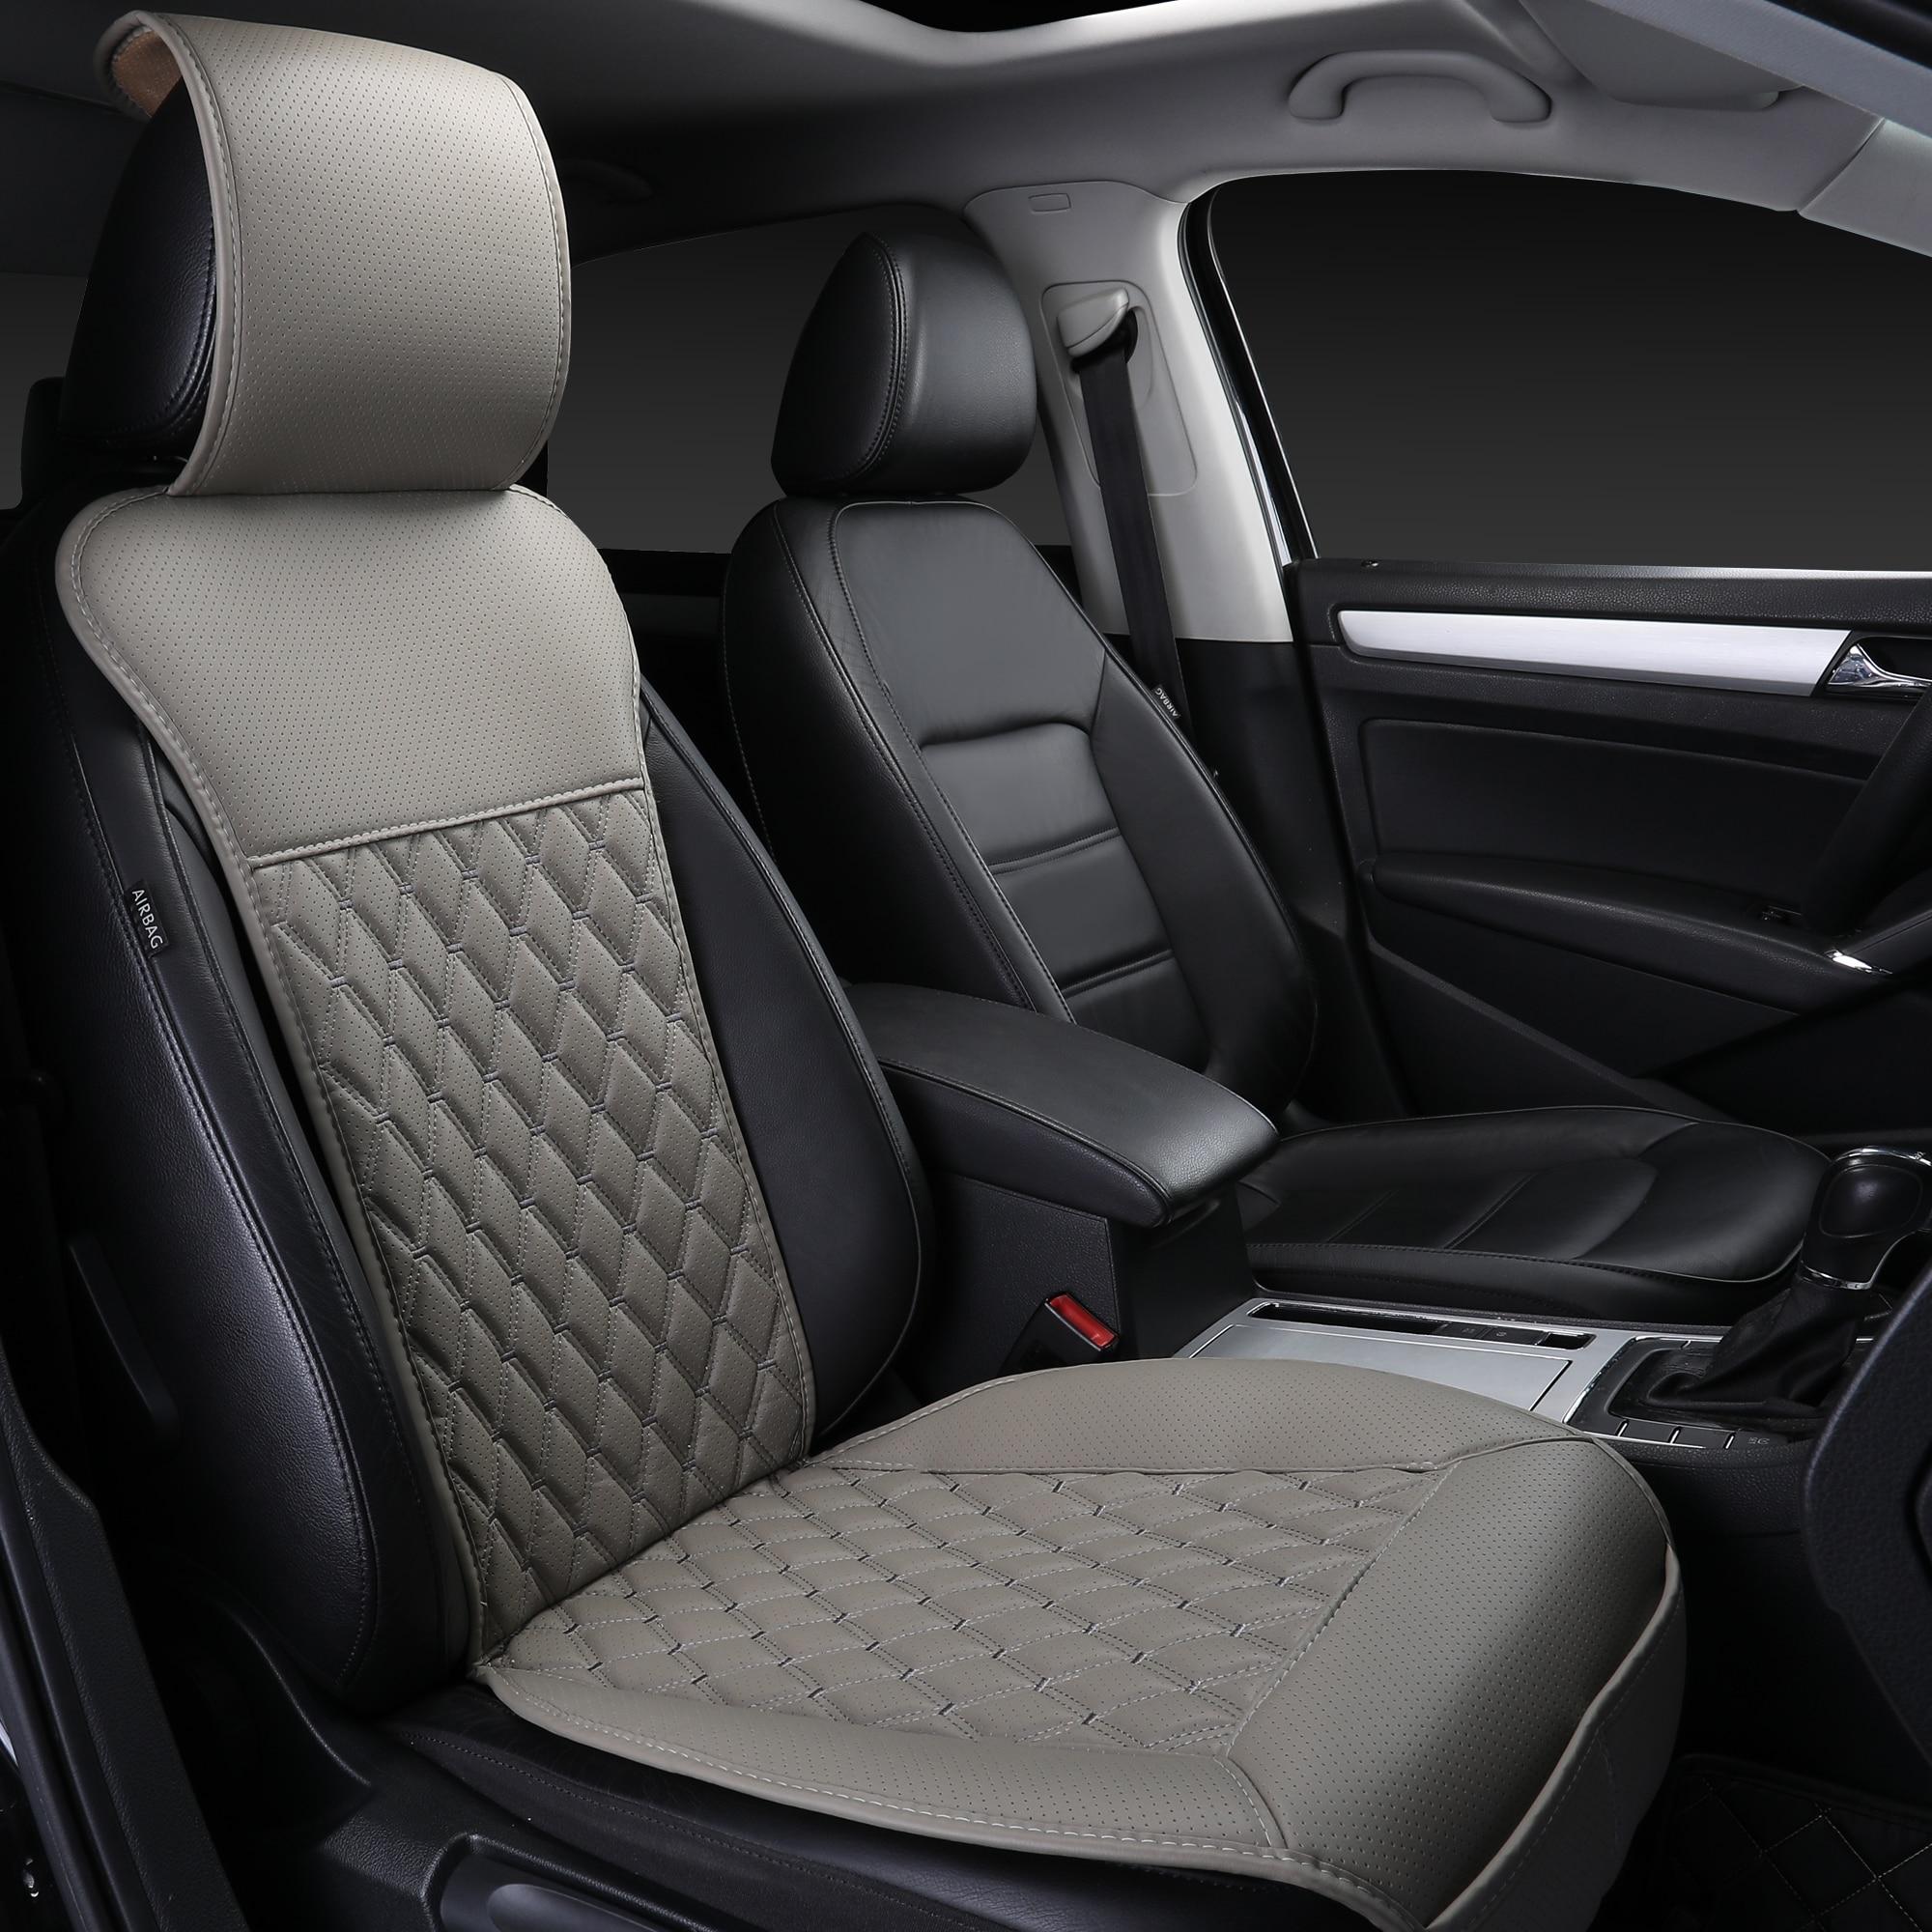 Kkysyelva universal capa de assento do carro almofada carros capa de automóvel assentos de automóvel almofada proteger automóvel interior acessórios automotivos